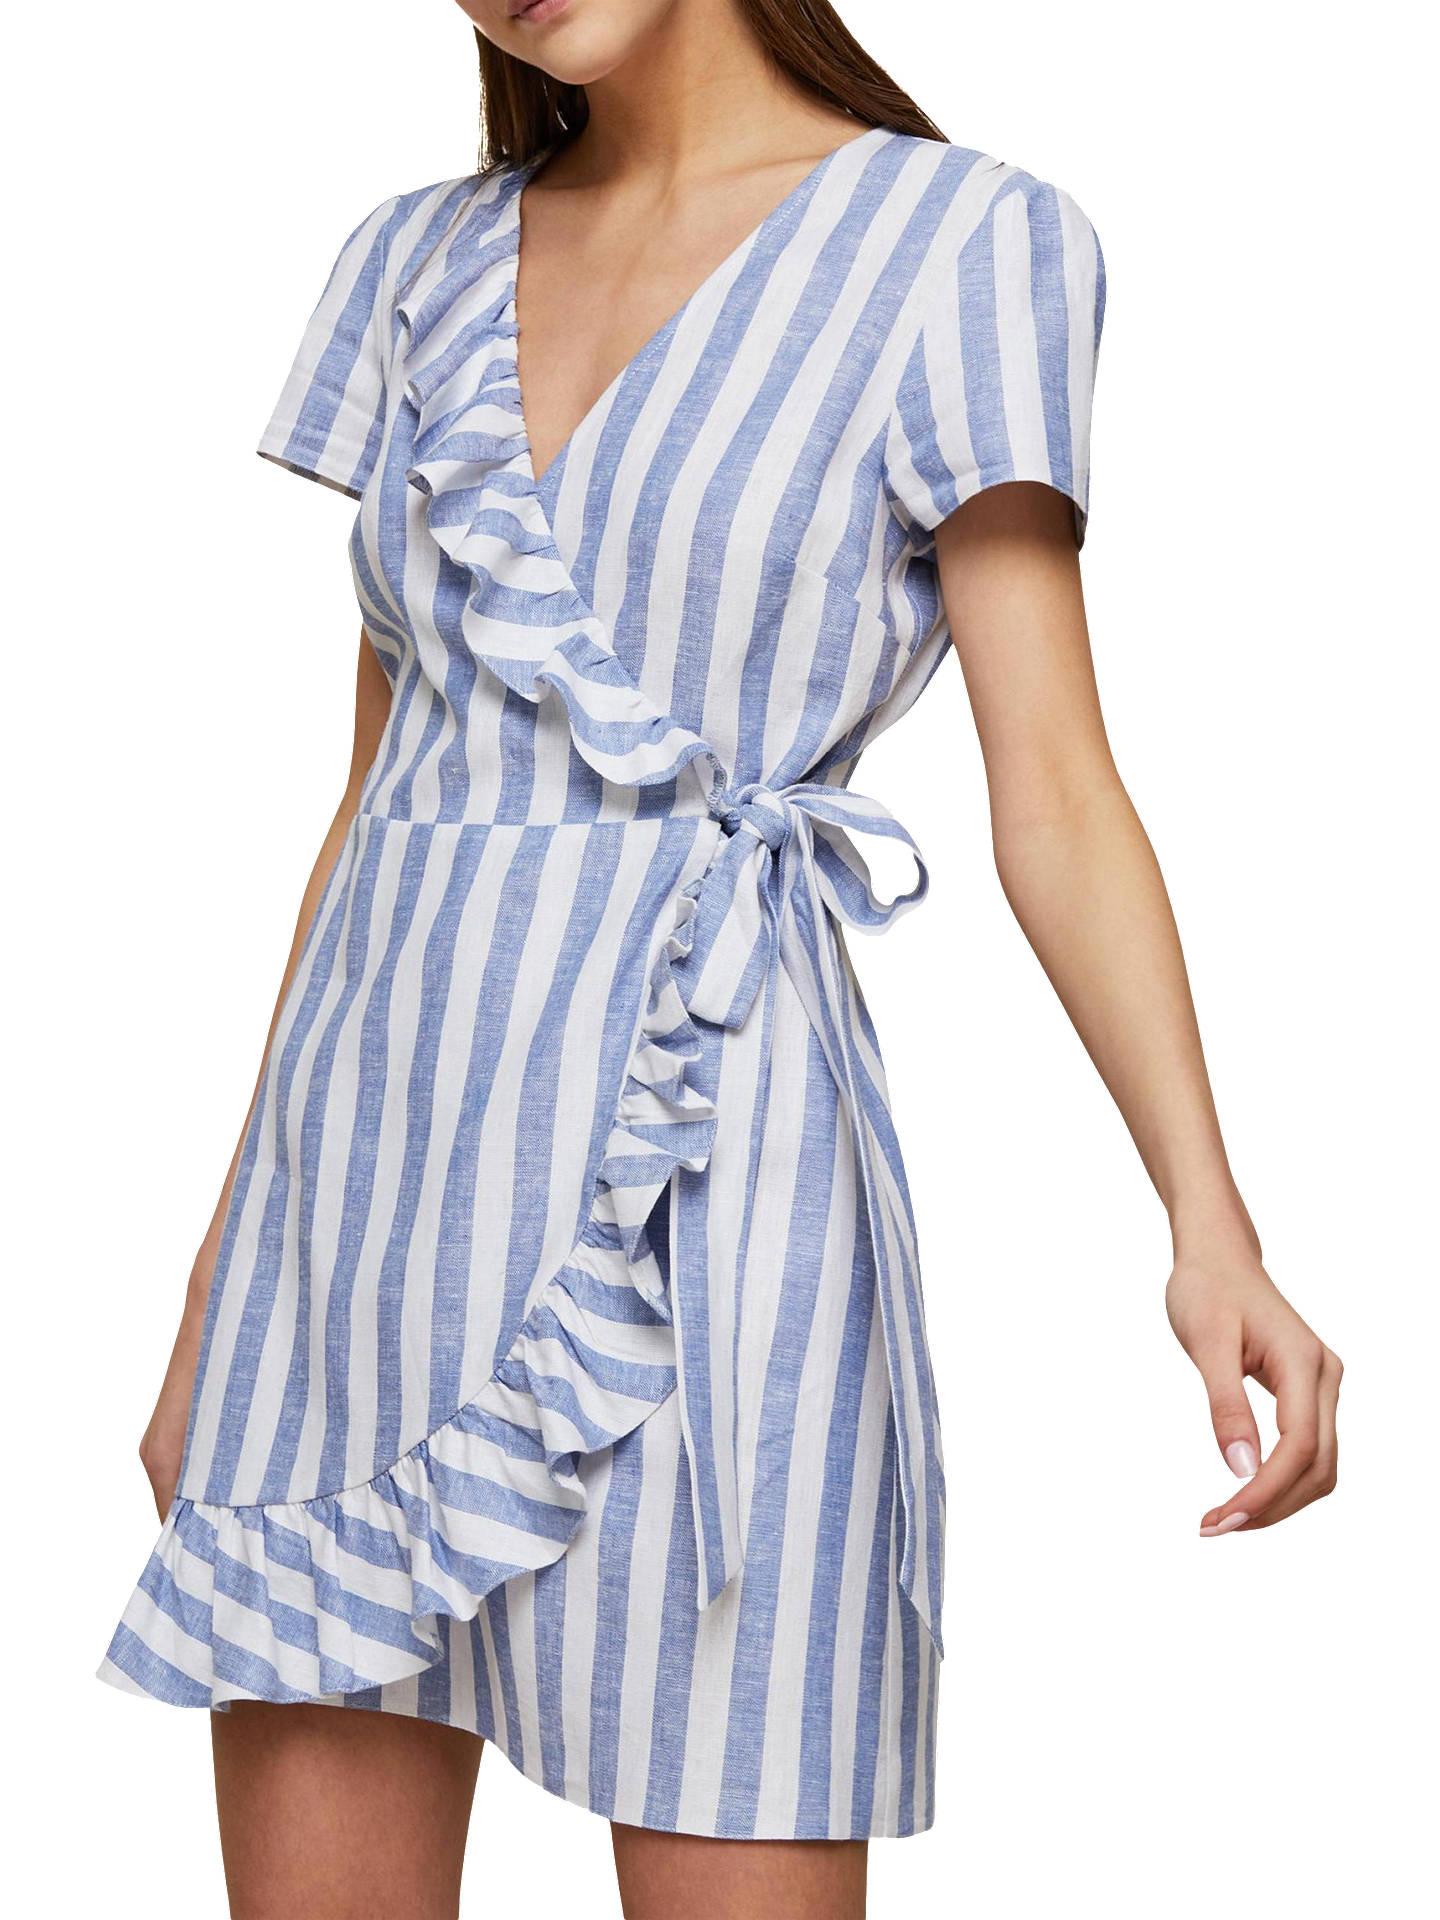 3868ed4d6505 Buy Miss Selfridge Petite Striped Wrap Dress